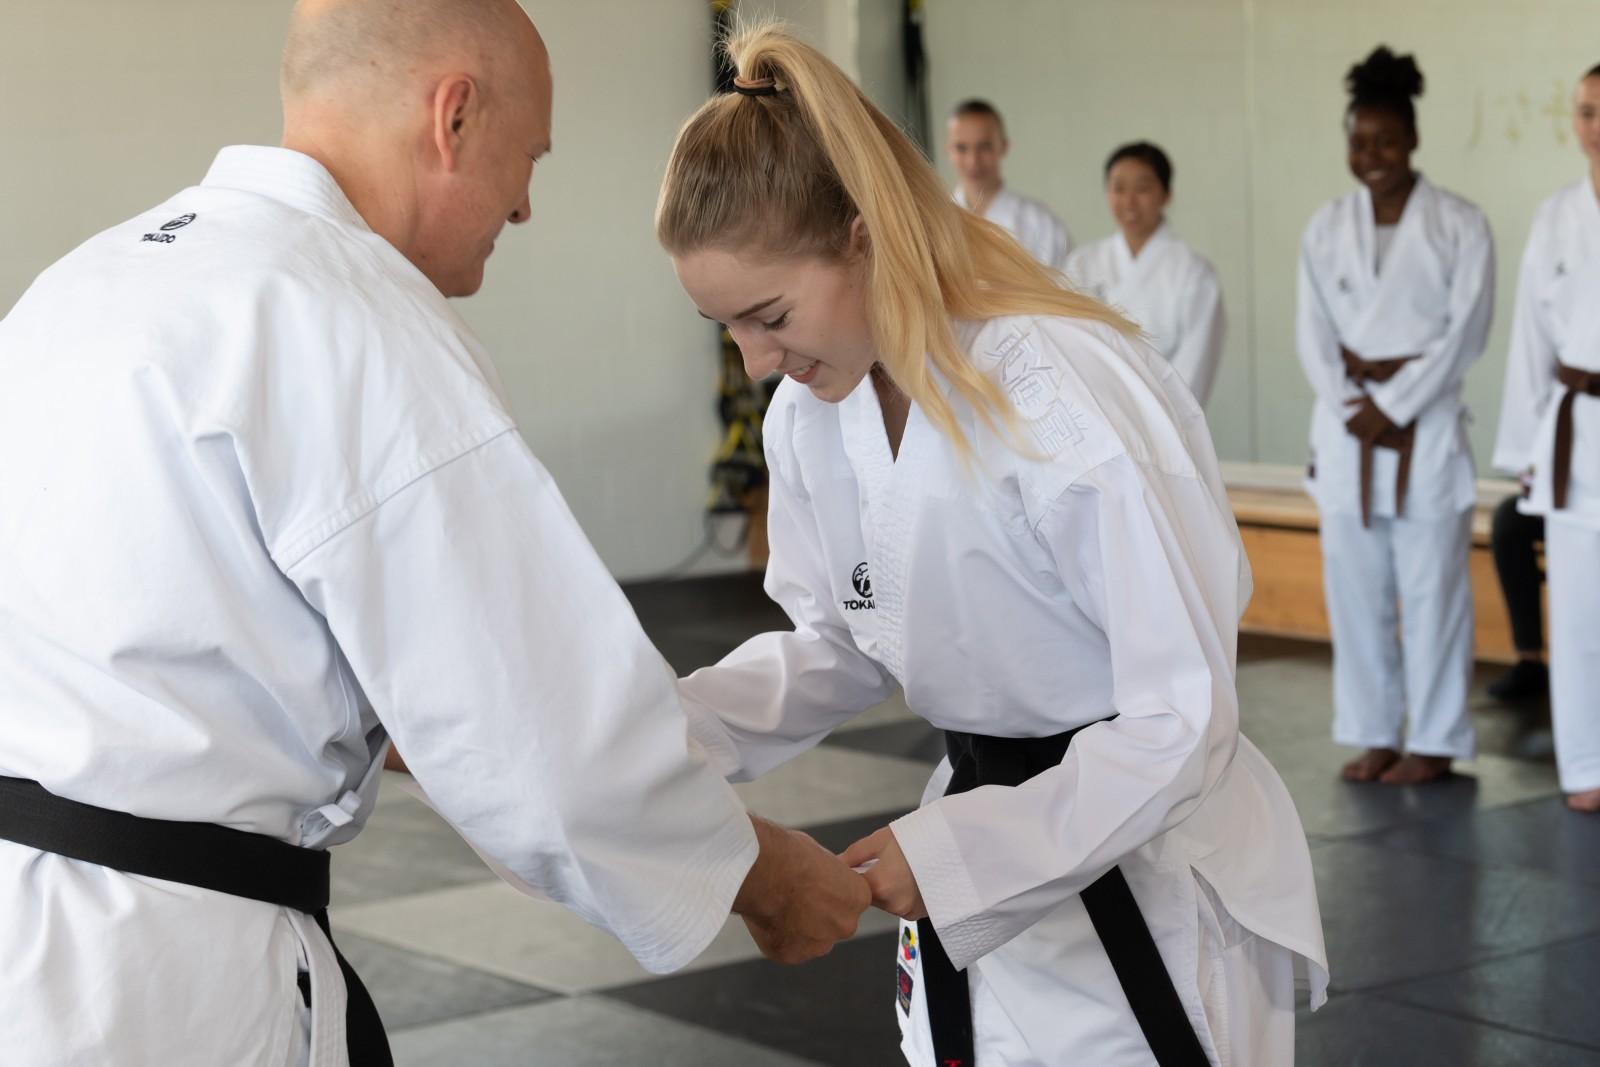 Claudio Caderas überreicht das Diplom an Nina Radjenovic